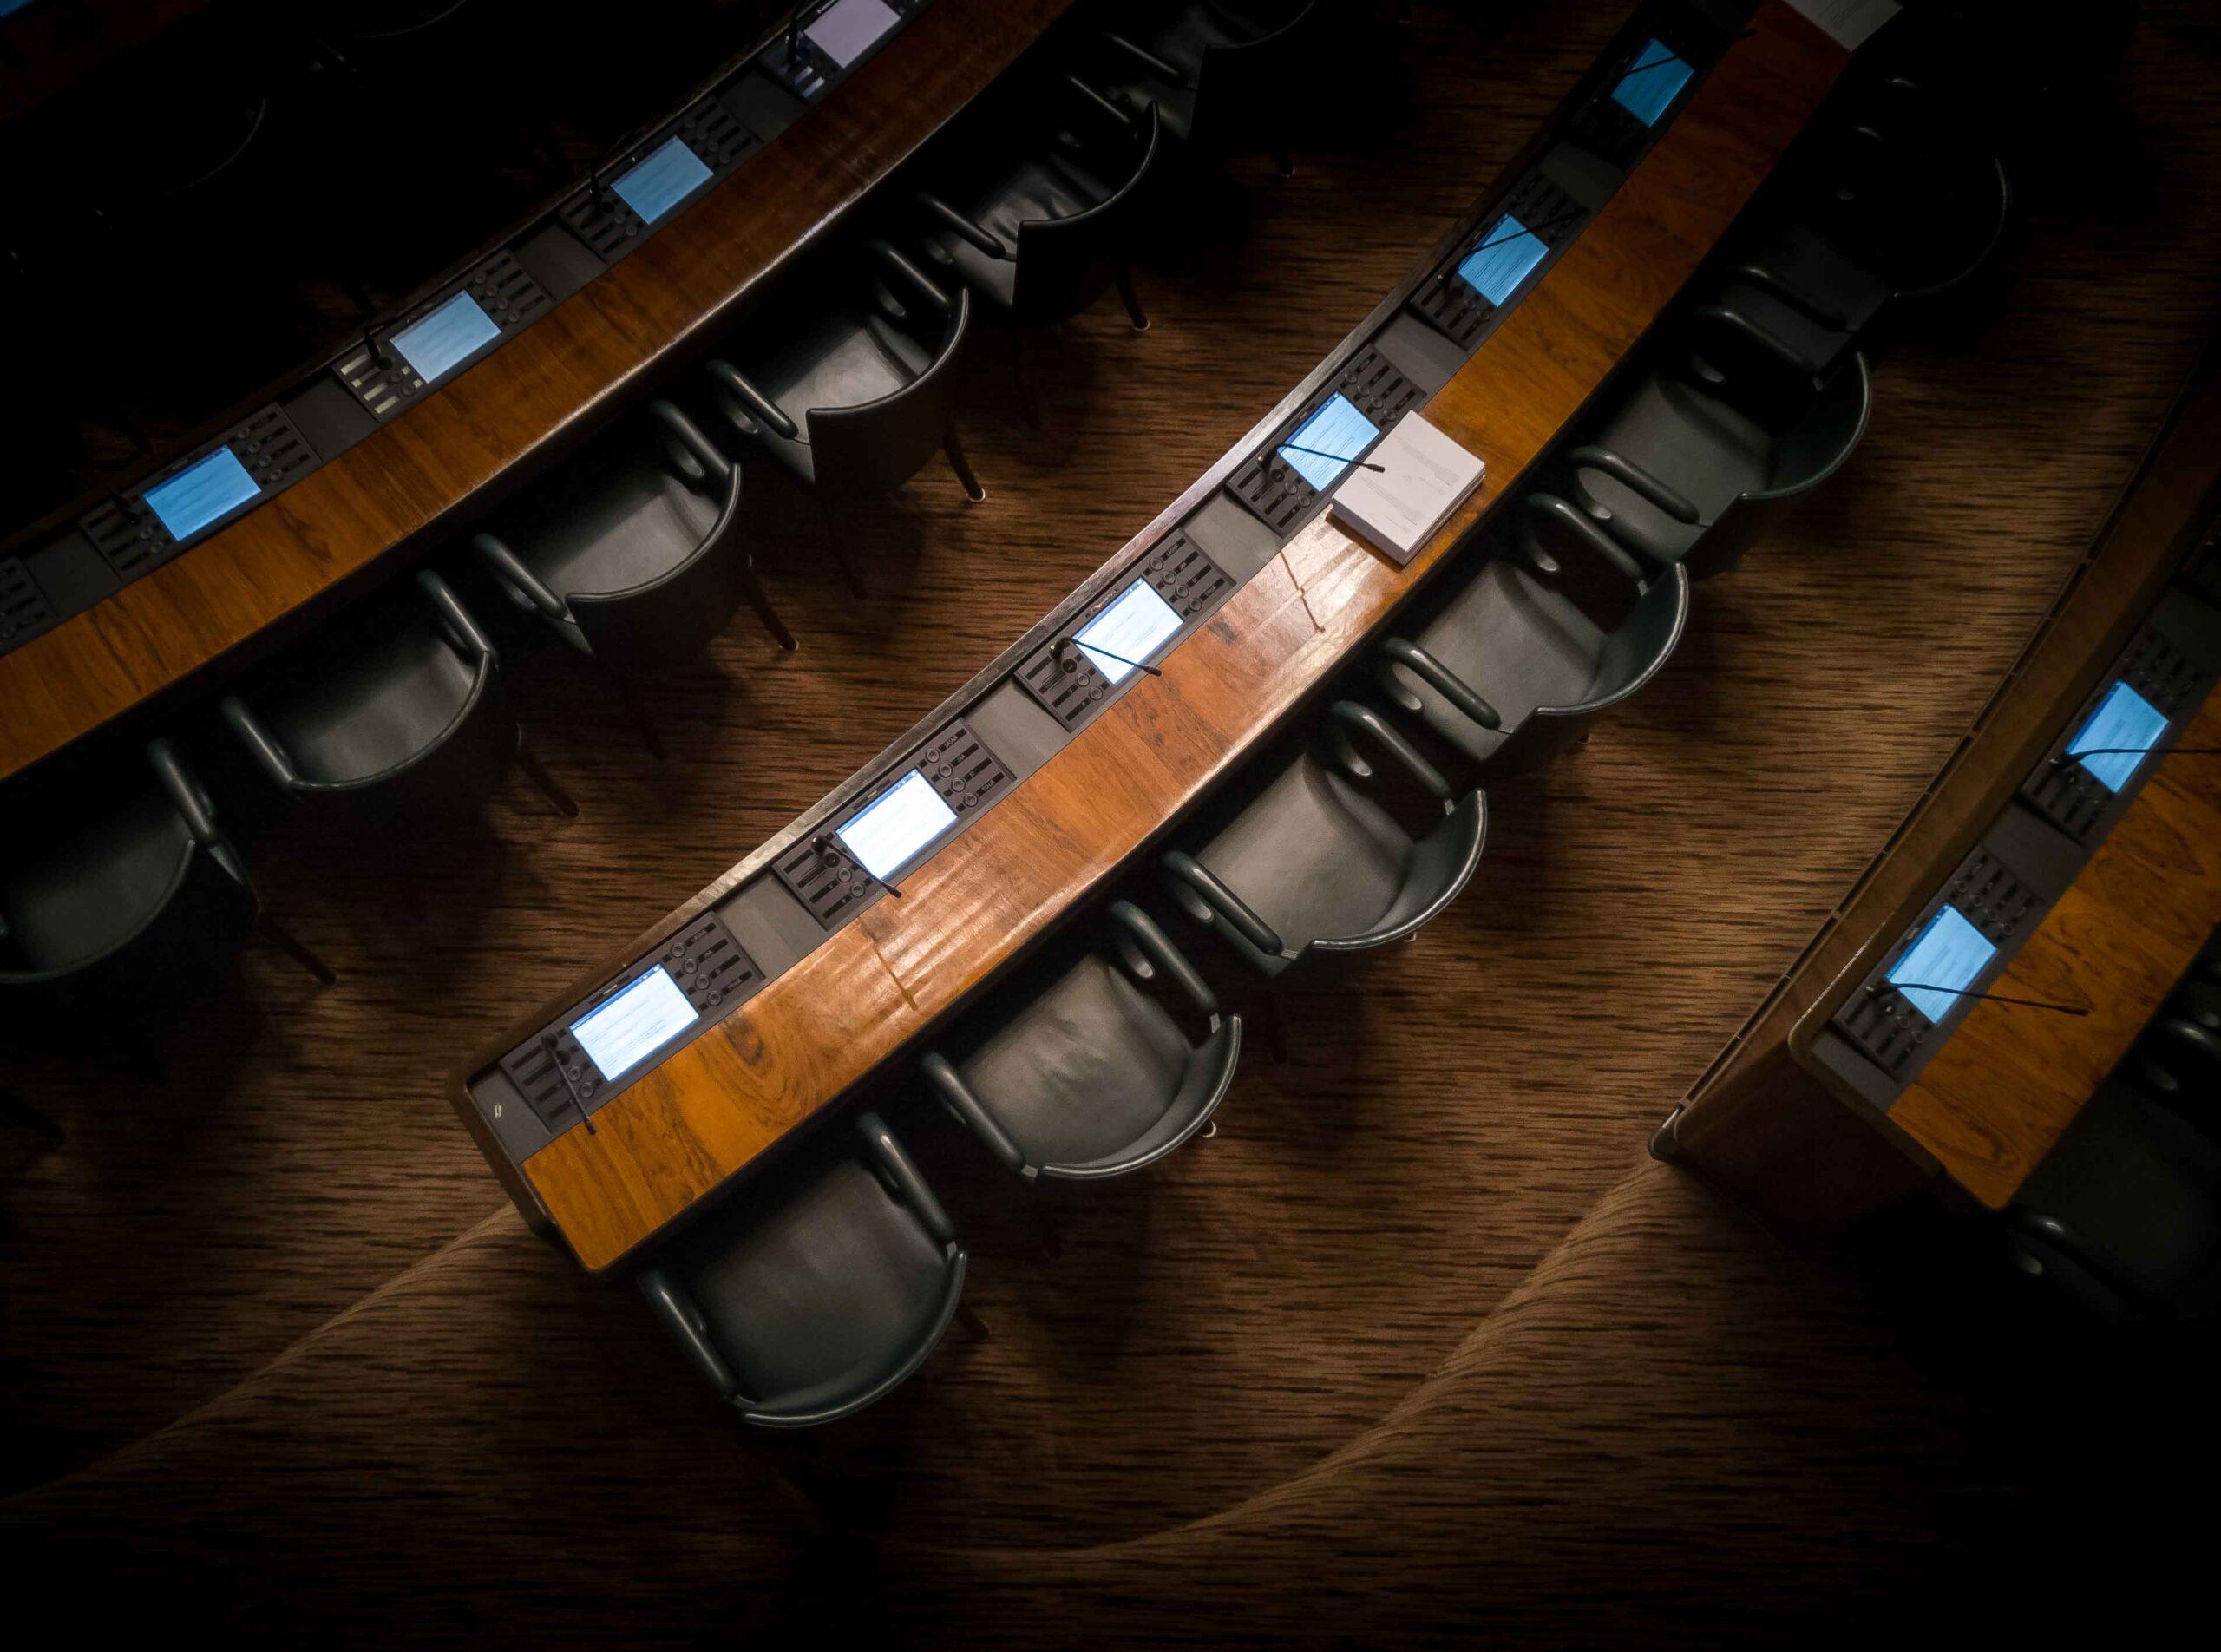 Image of legislature